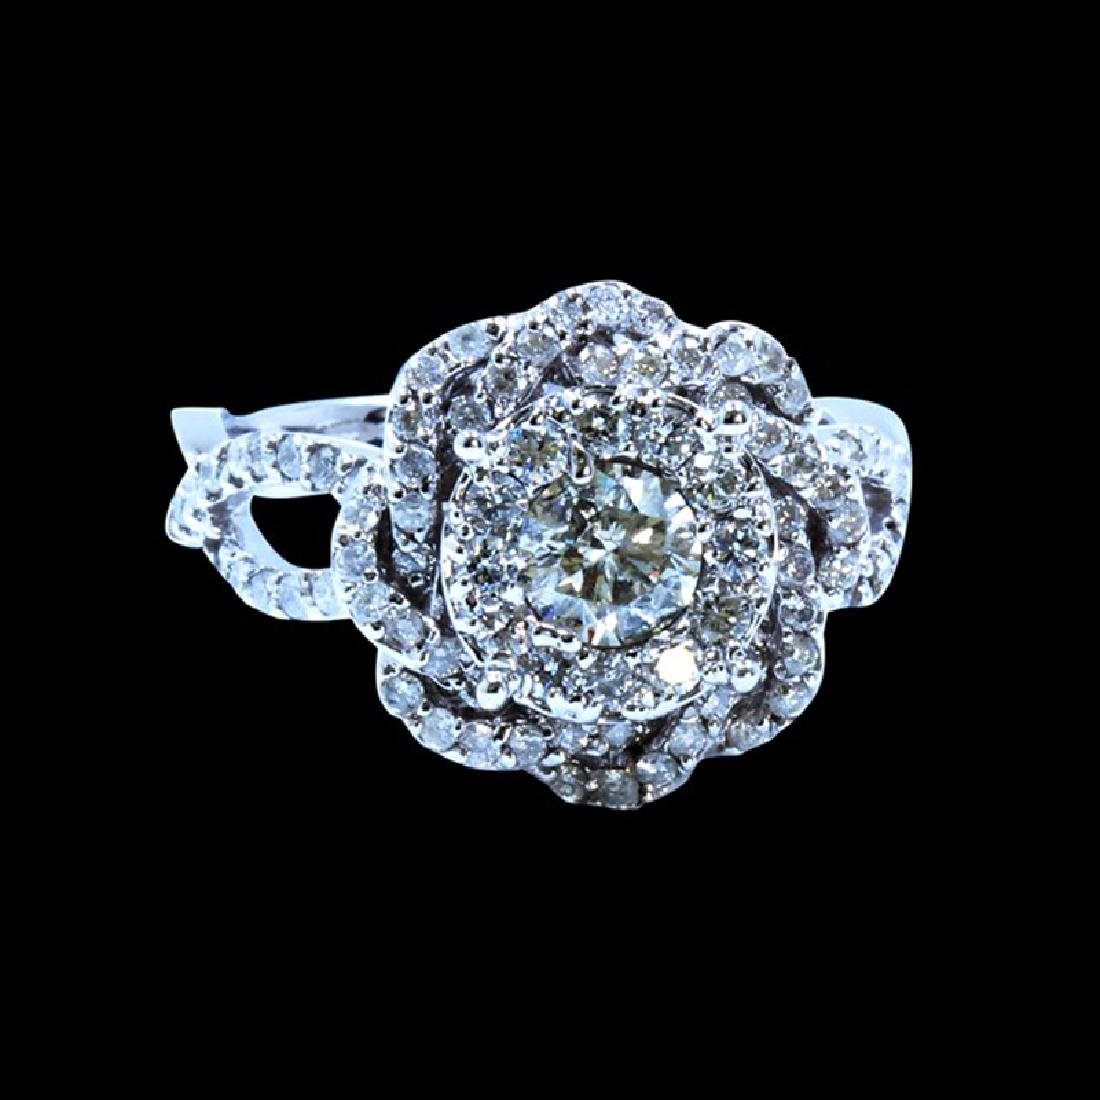 0.91CT NATURAL DIAMOND 14K WHITE GOLD RING